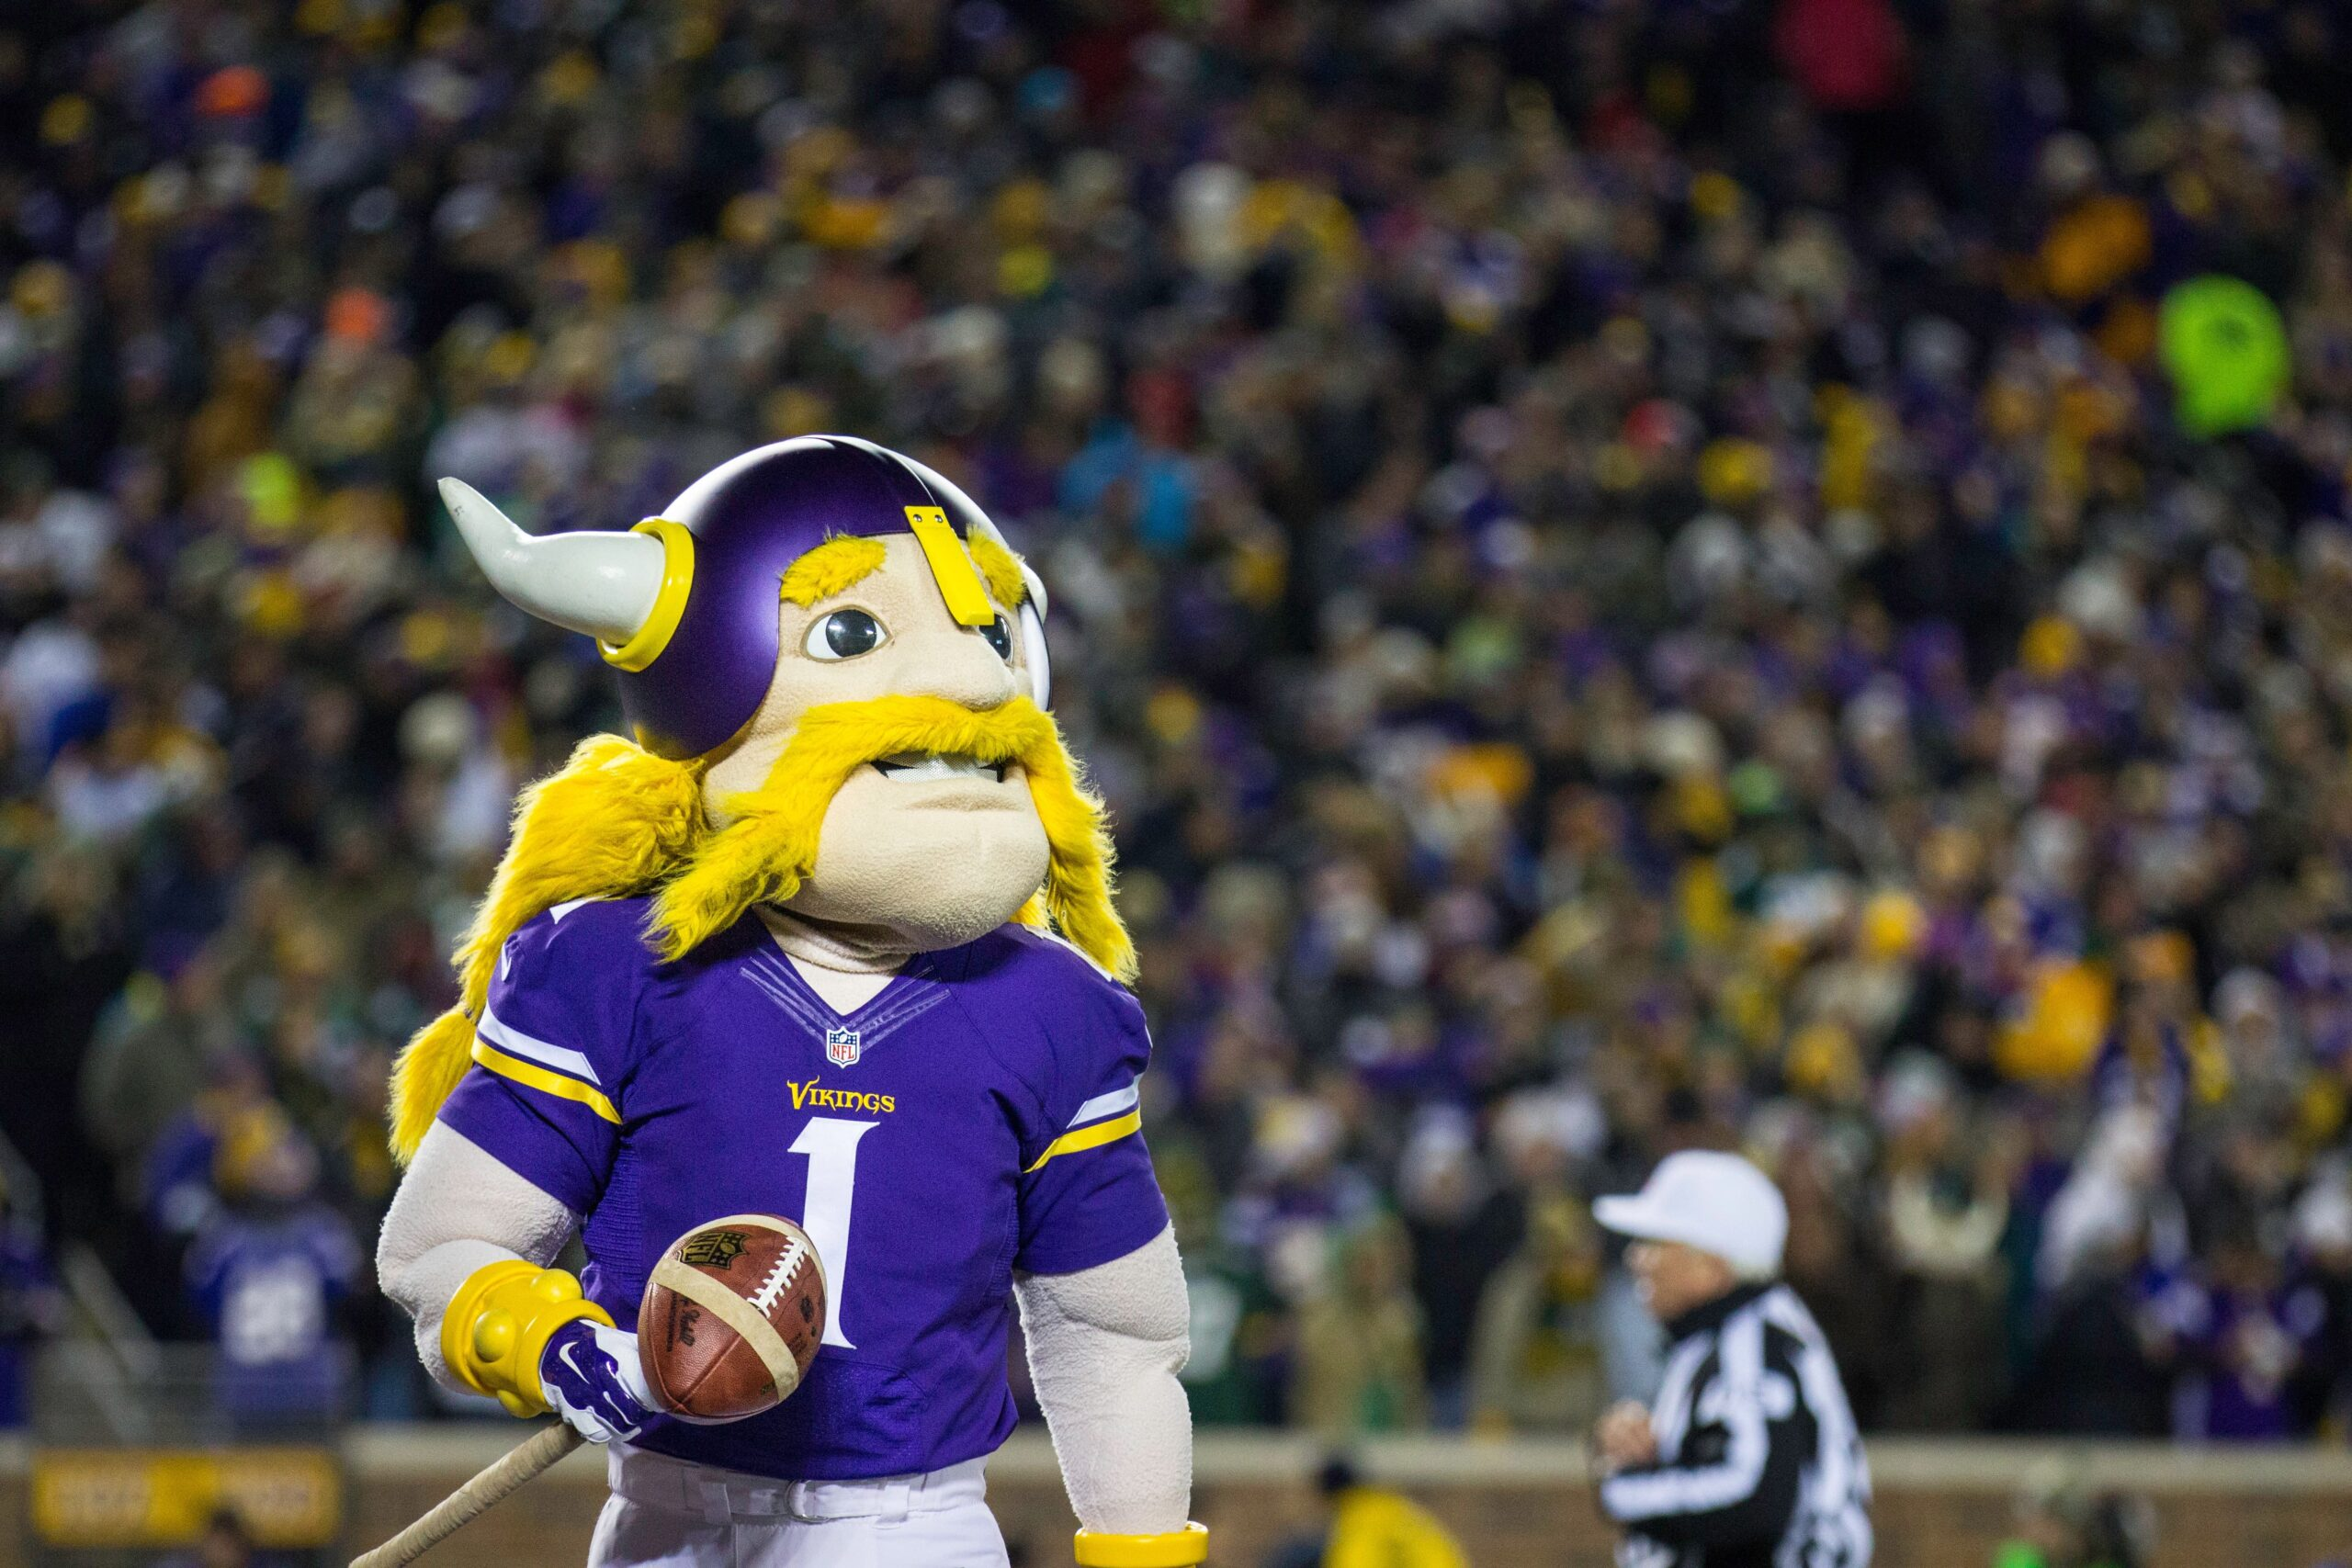 Minnesota Vikings Mascot scaled